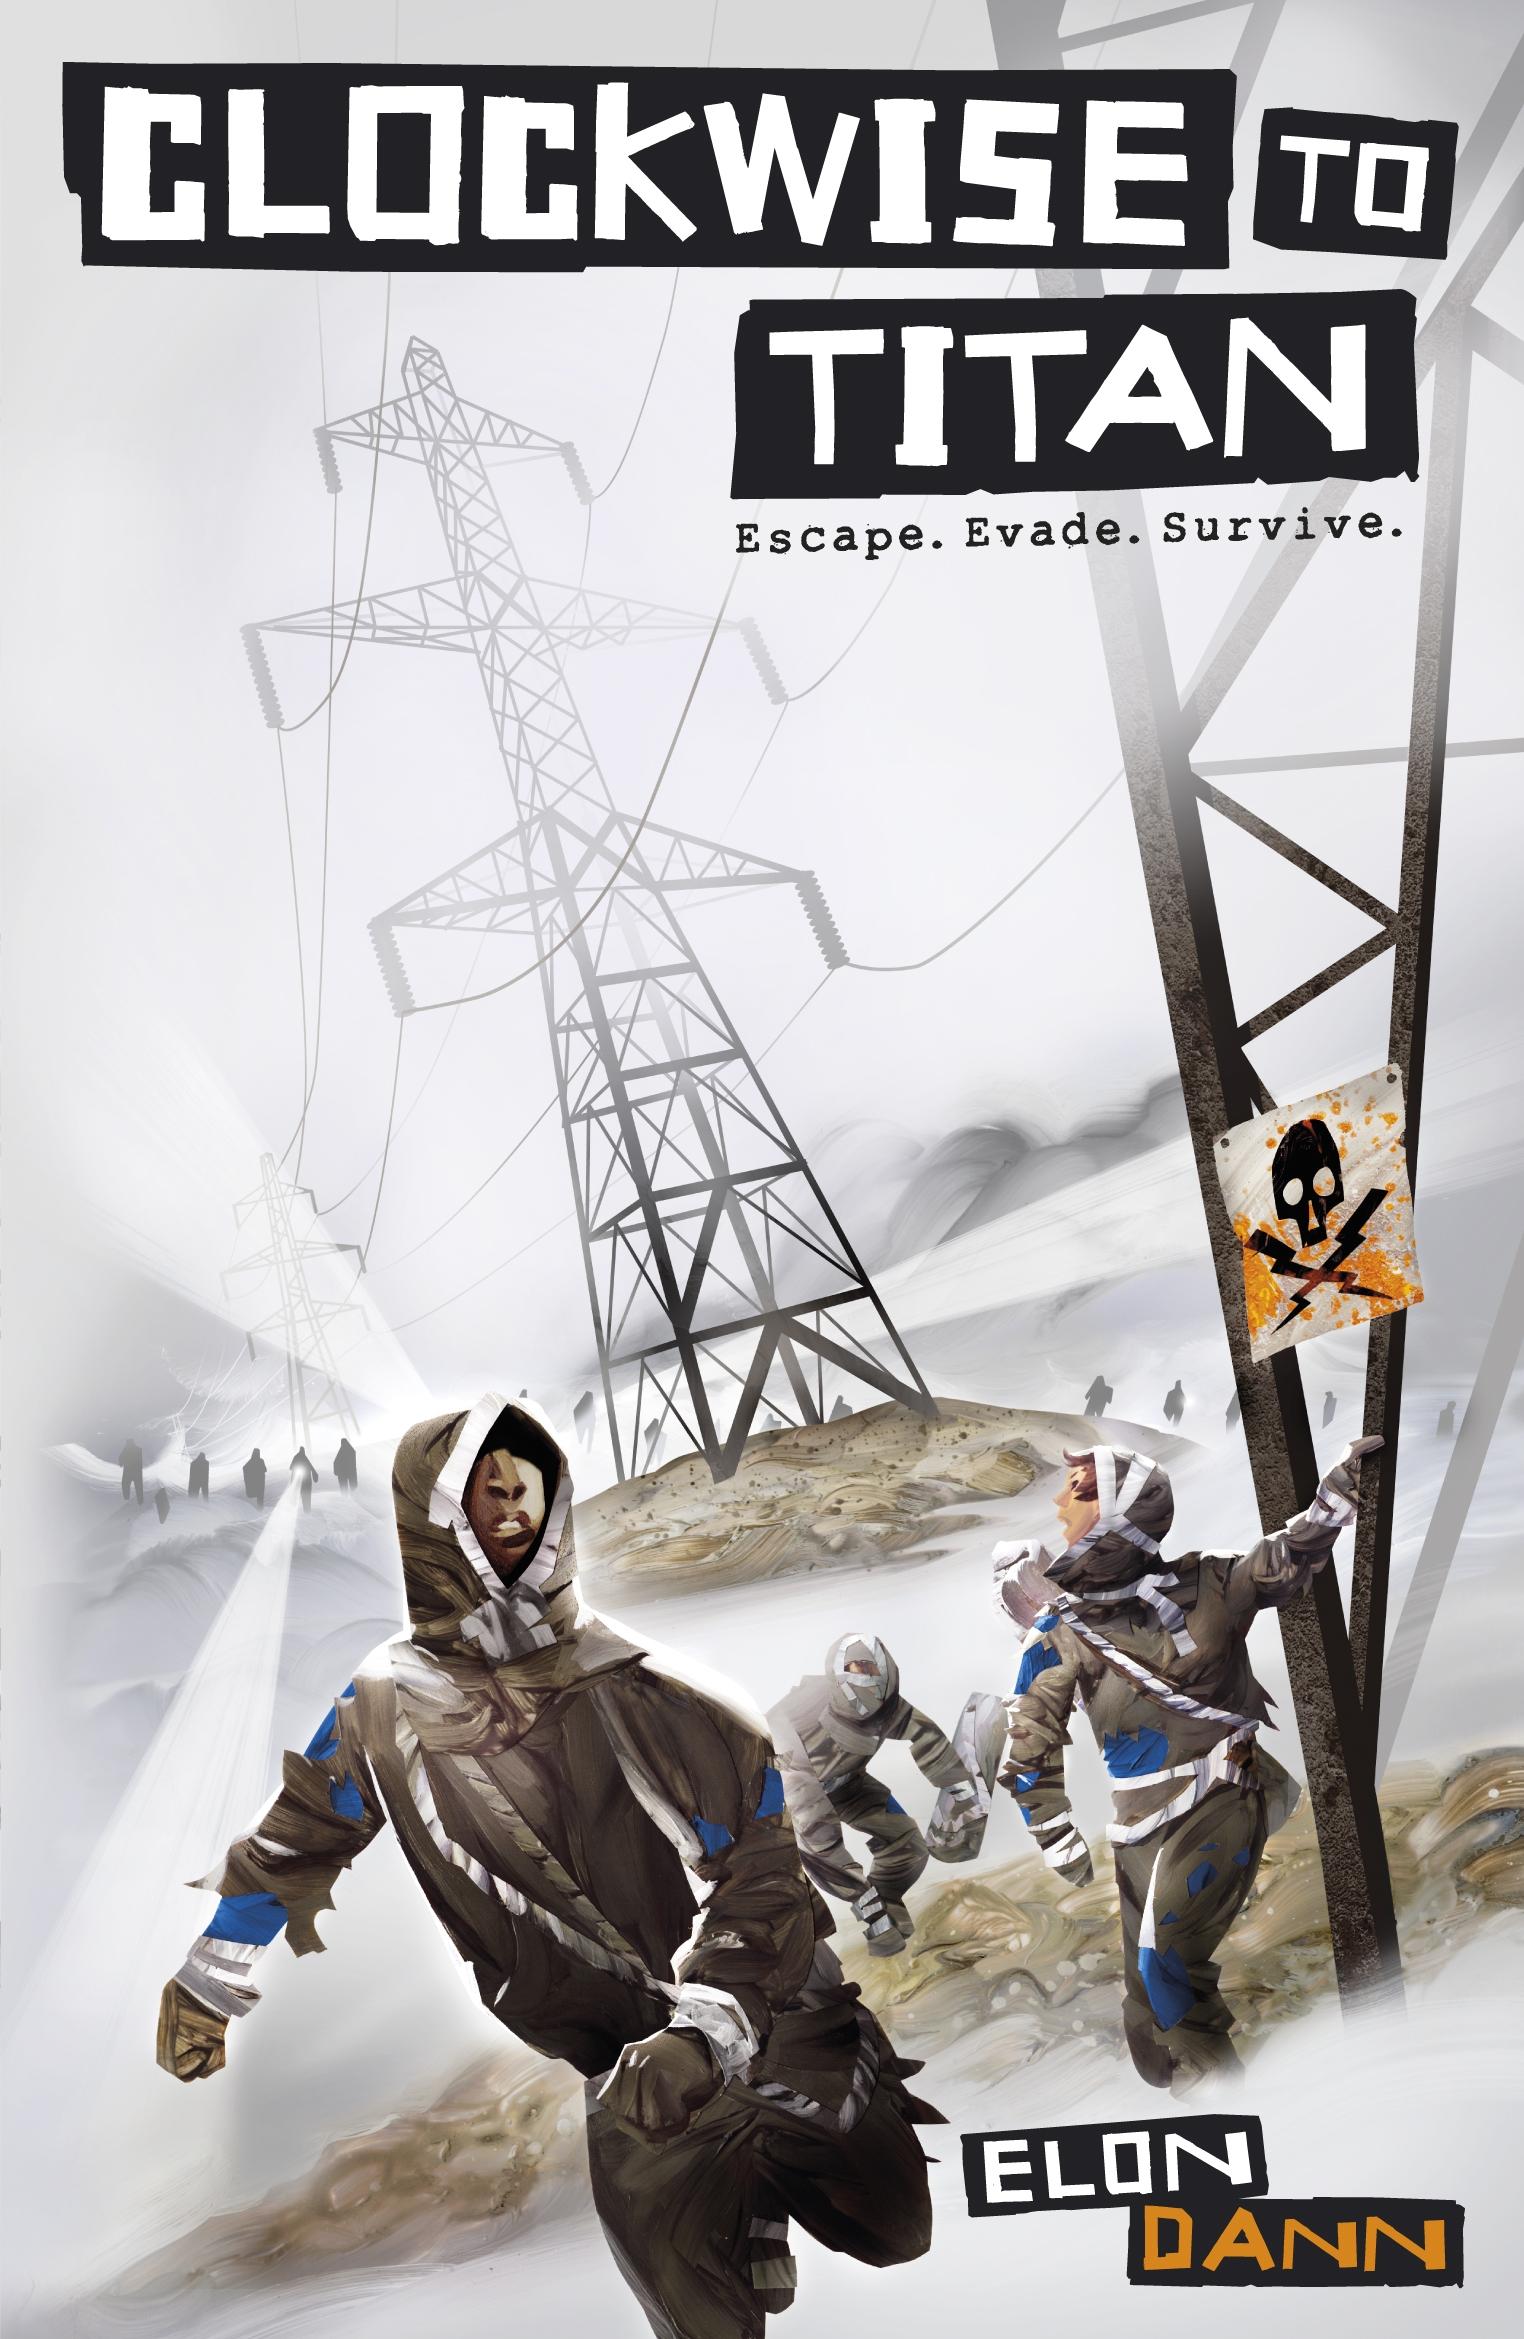 Clockwise to Titan by Elon Dann